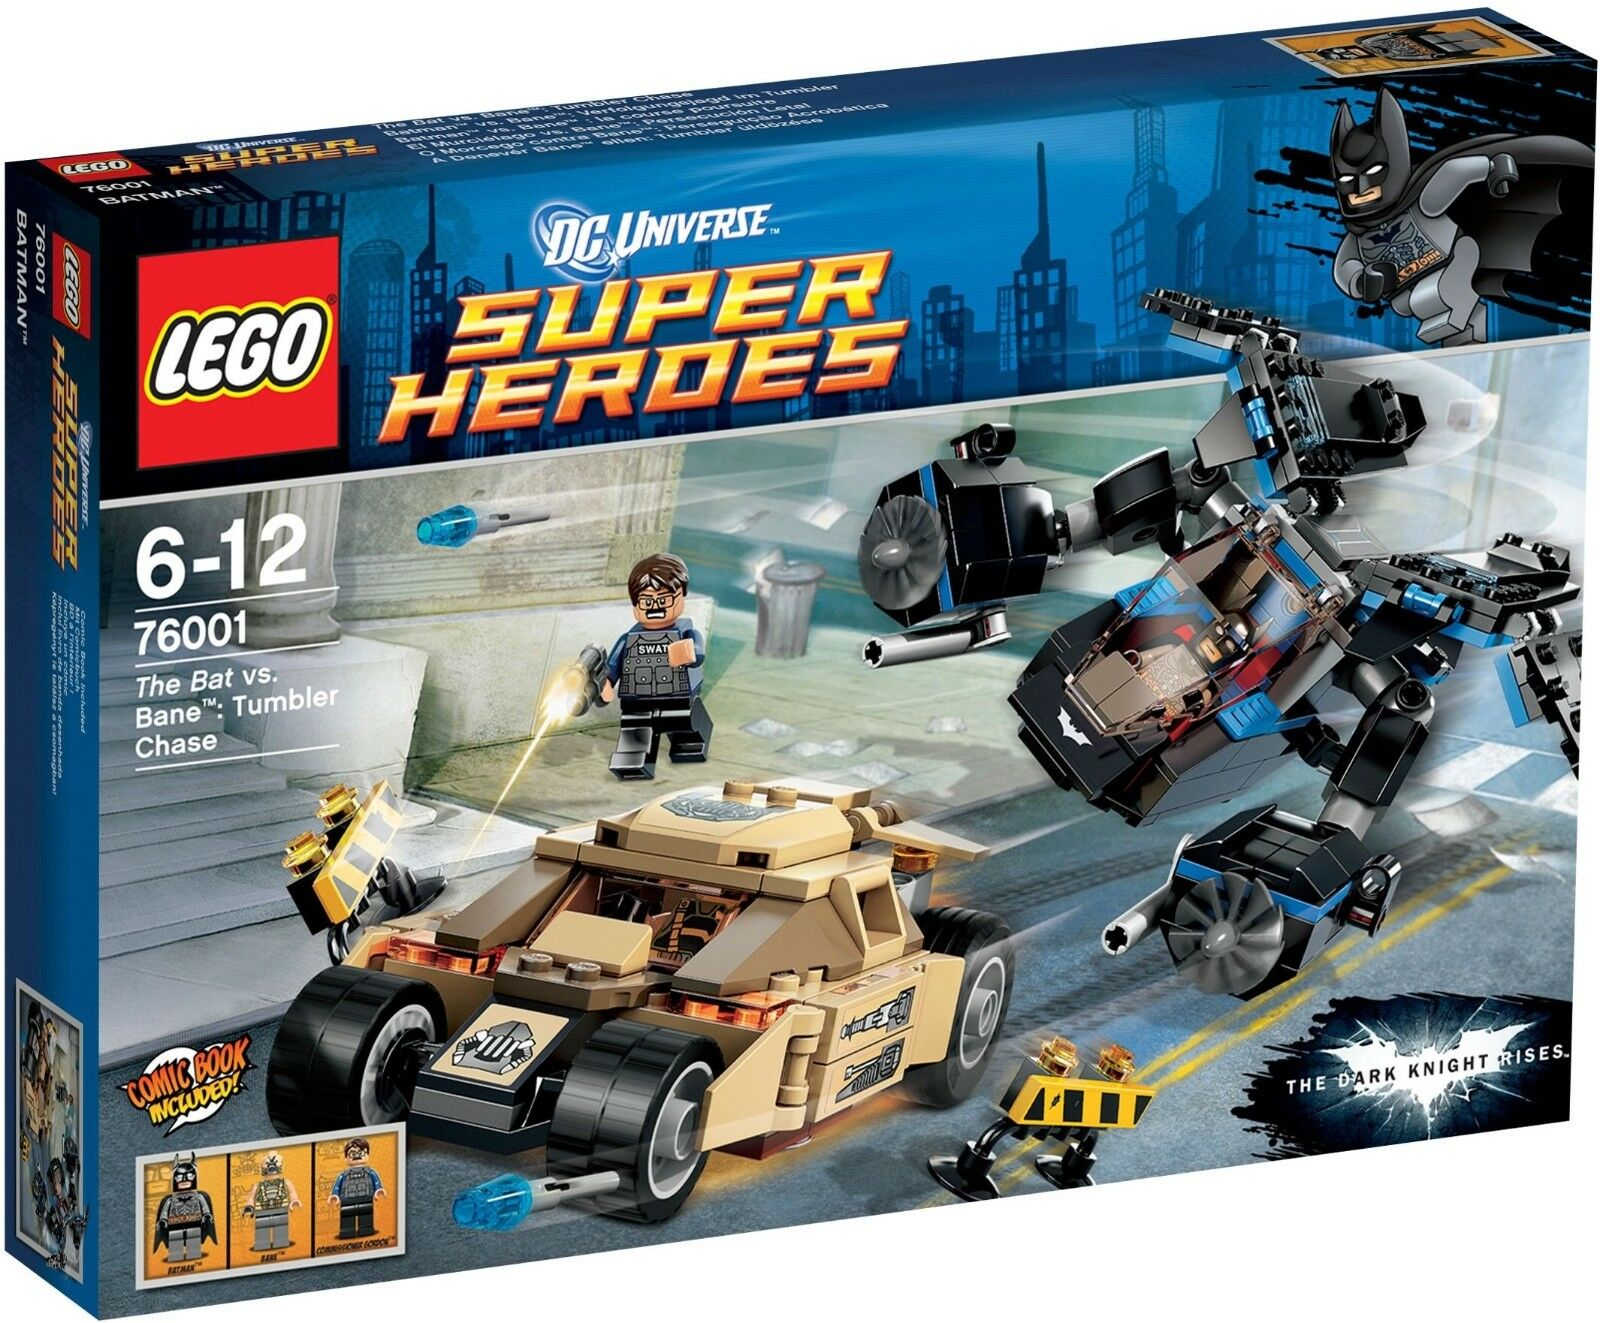 LEGO DC Comics  The Bat vs. Bane  Tumbler Chase  (76001) - NEW - BOX UNMARKED